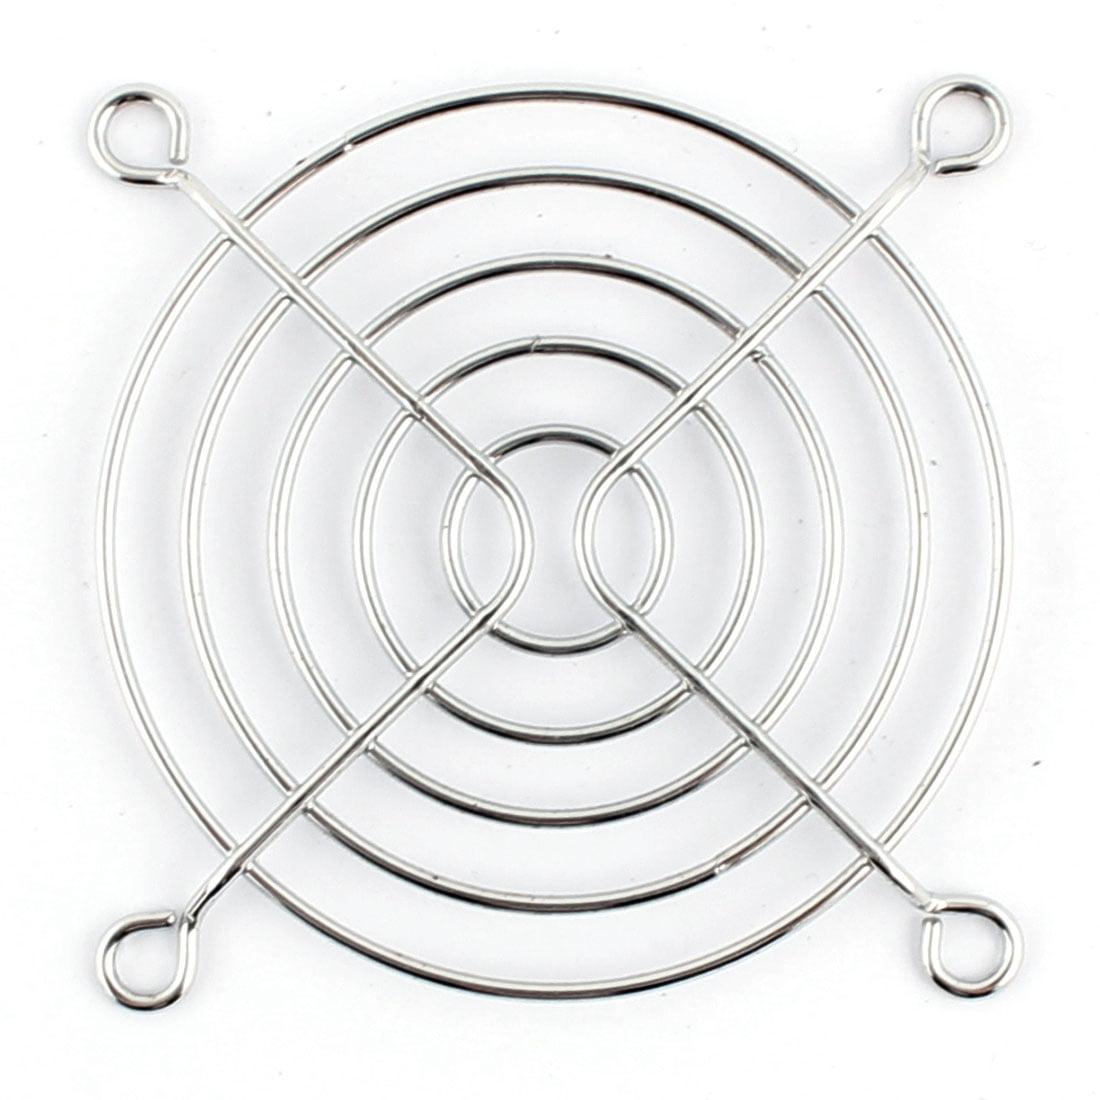 Metal Pc Computer Case Fan Grill Finger Guard Protector Silver Tone